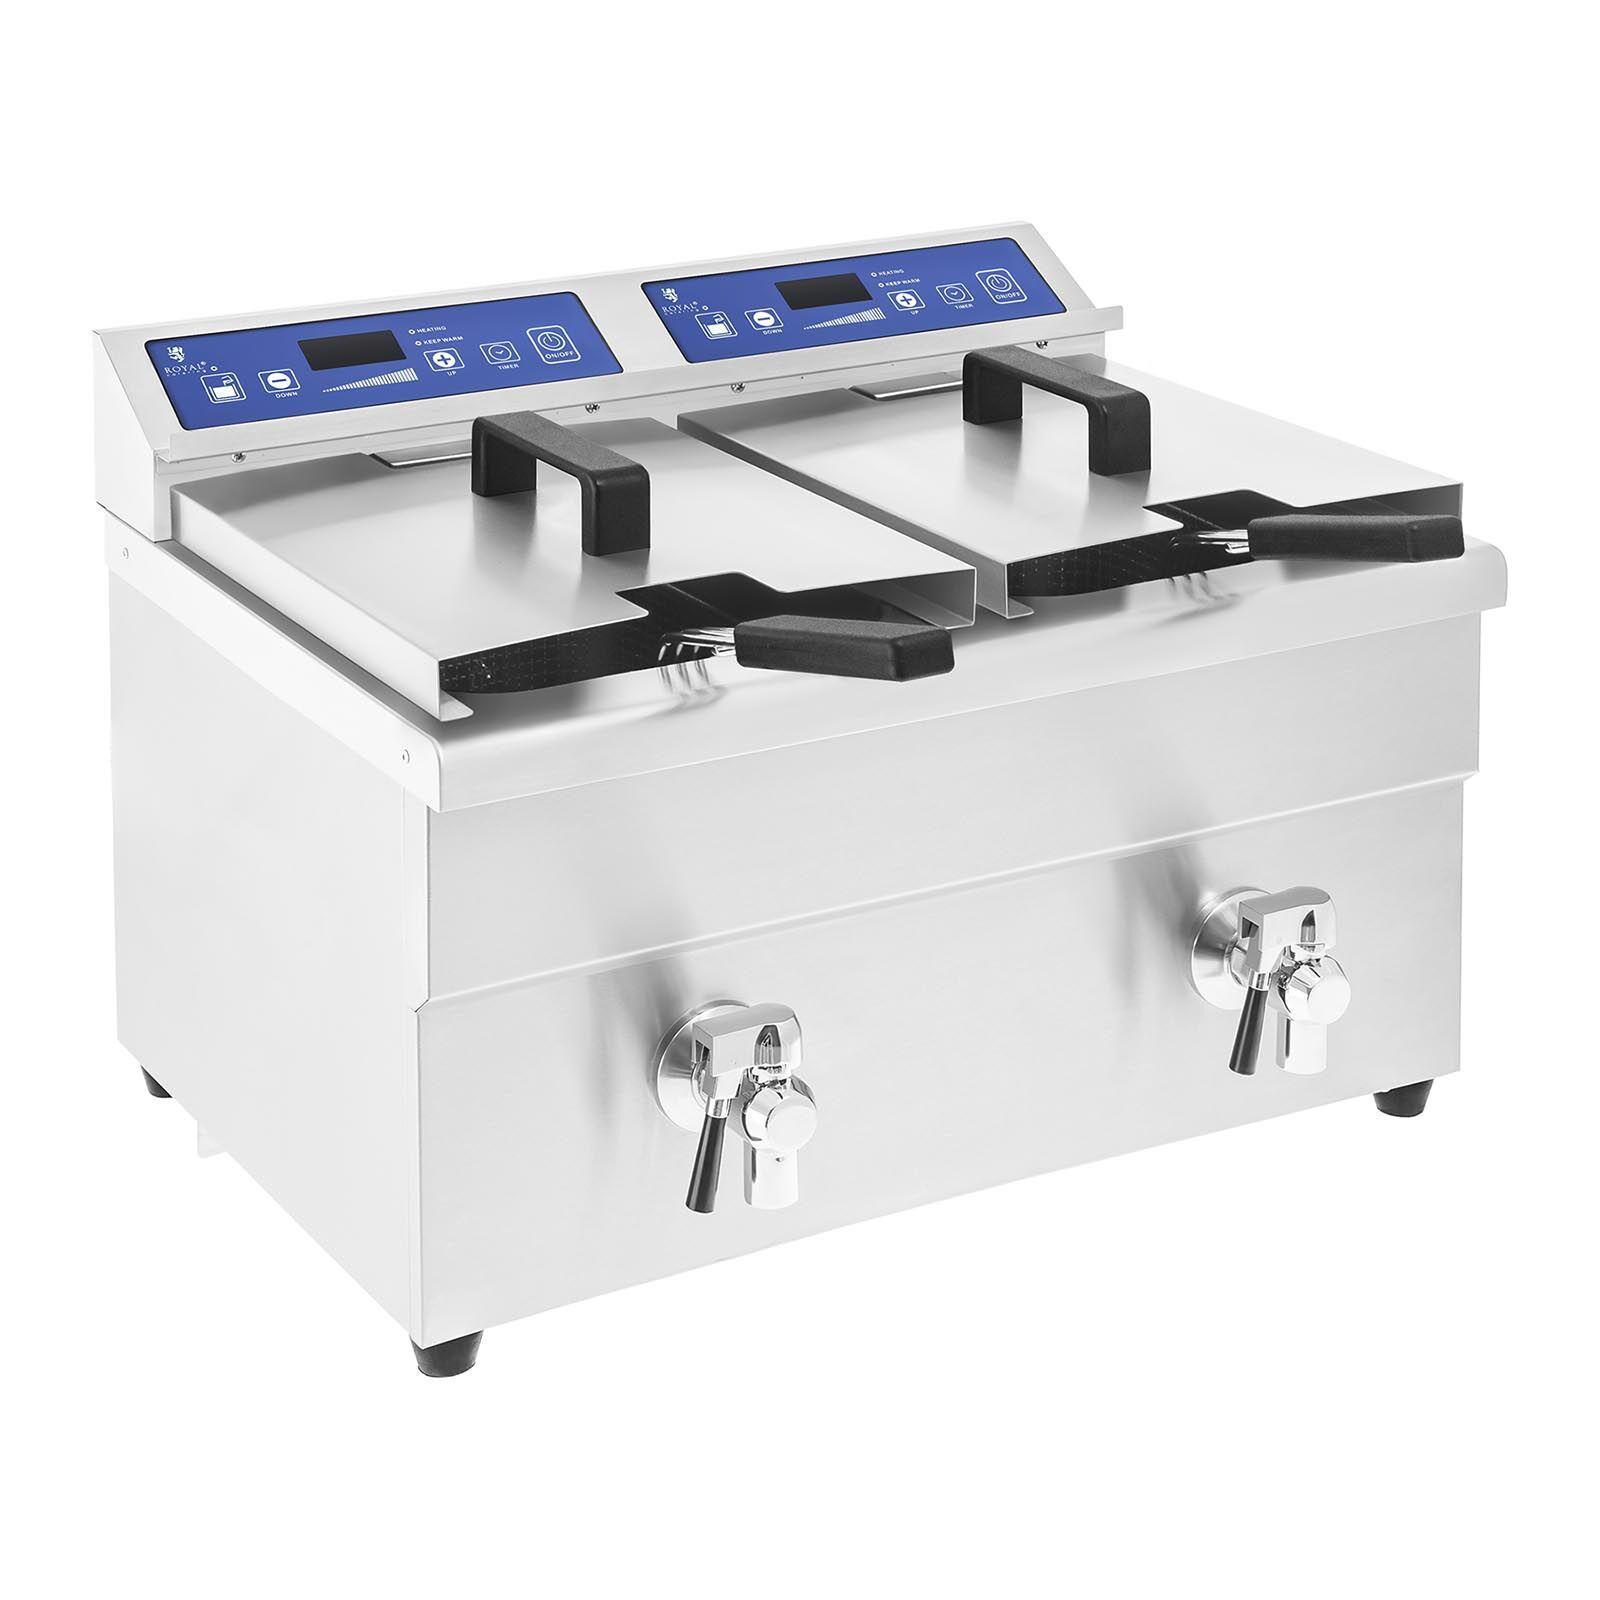 Royal Catering Friteuse à induction - 2 x 10 litres - 60 à 190°C RCIF-10DB